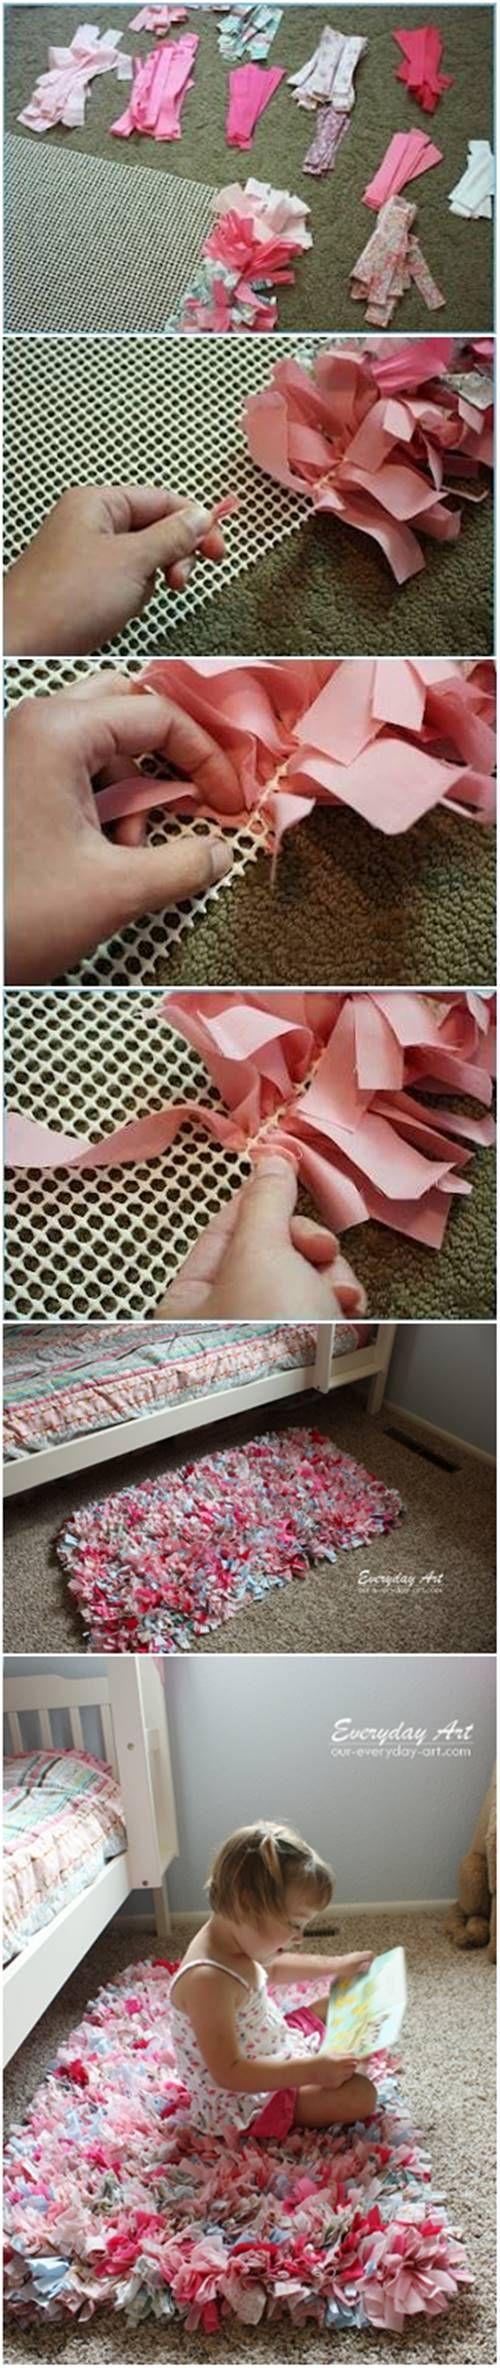 DIY Adorable Handmade Rag Rug #craft #rug